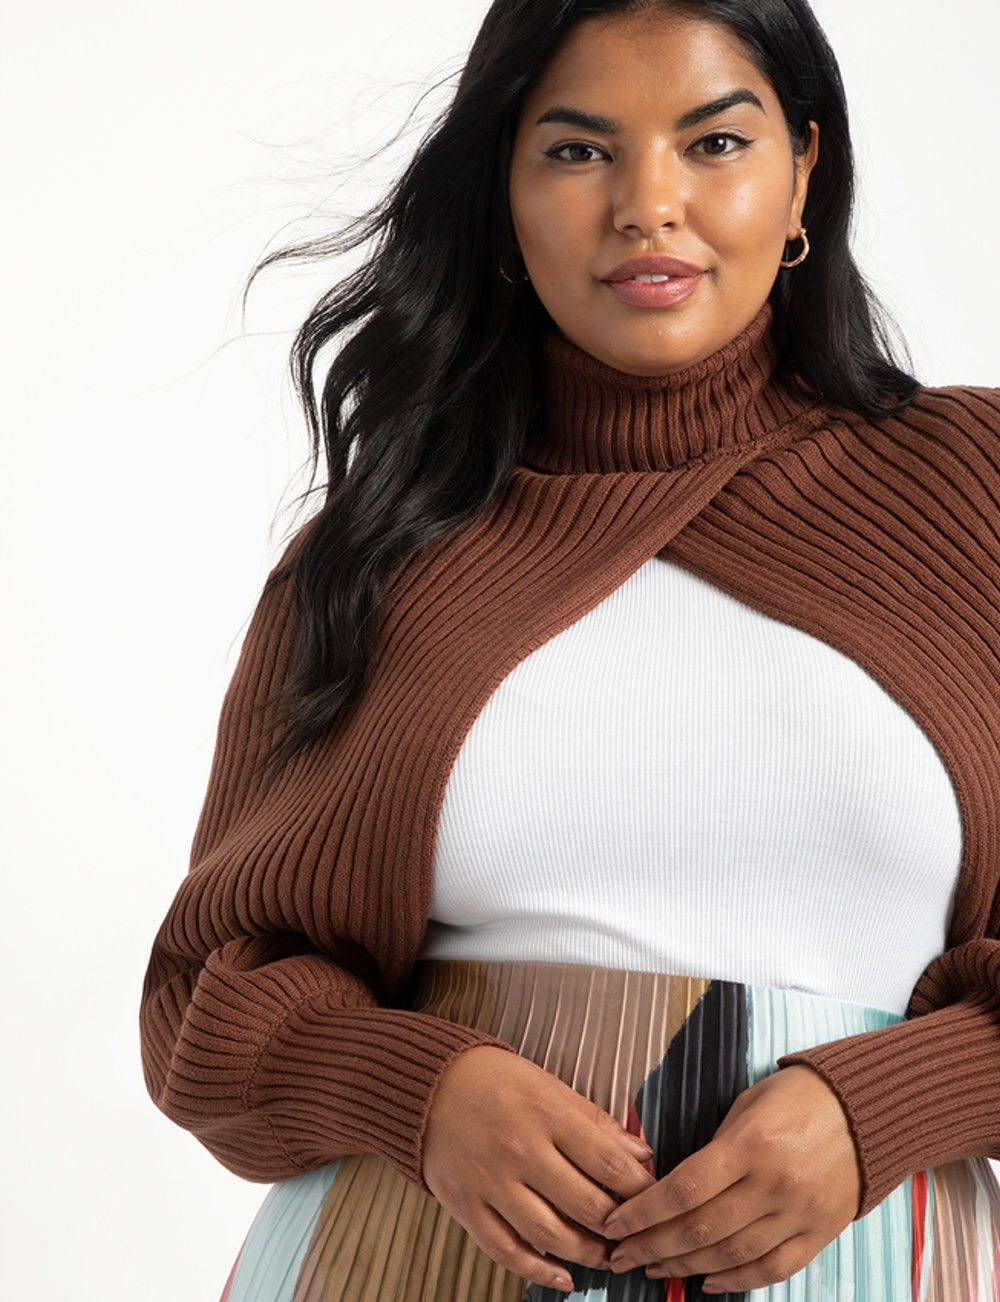 Turtleneck Sweater Sleeve Scarf